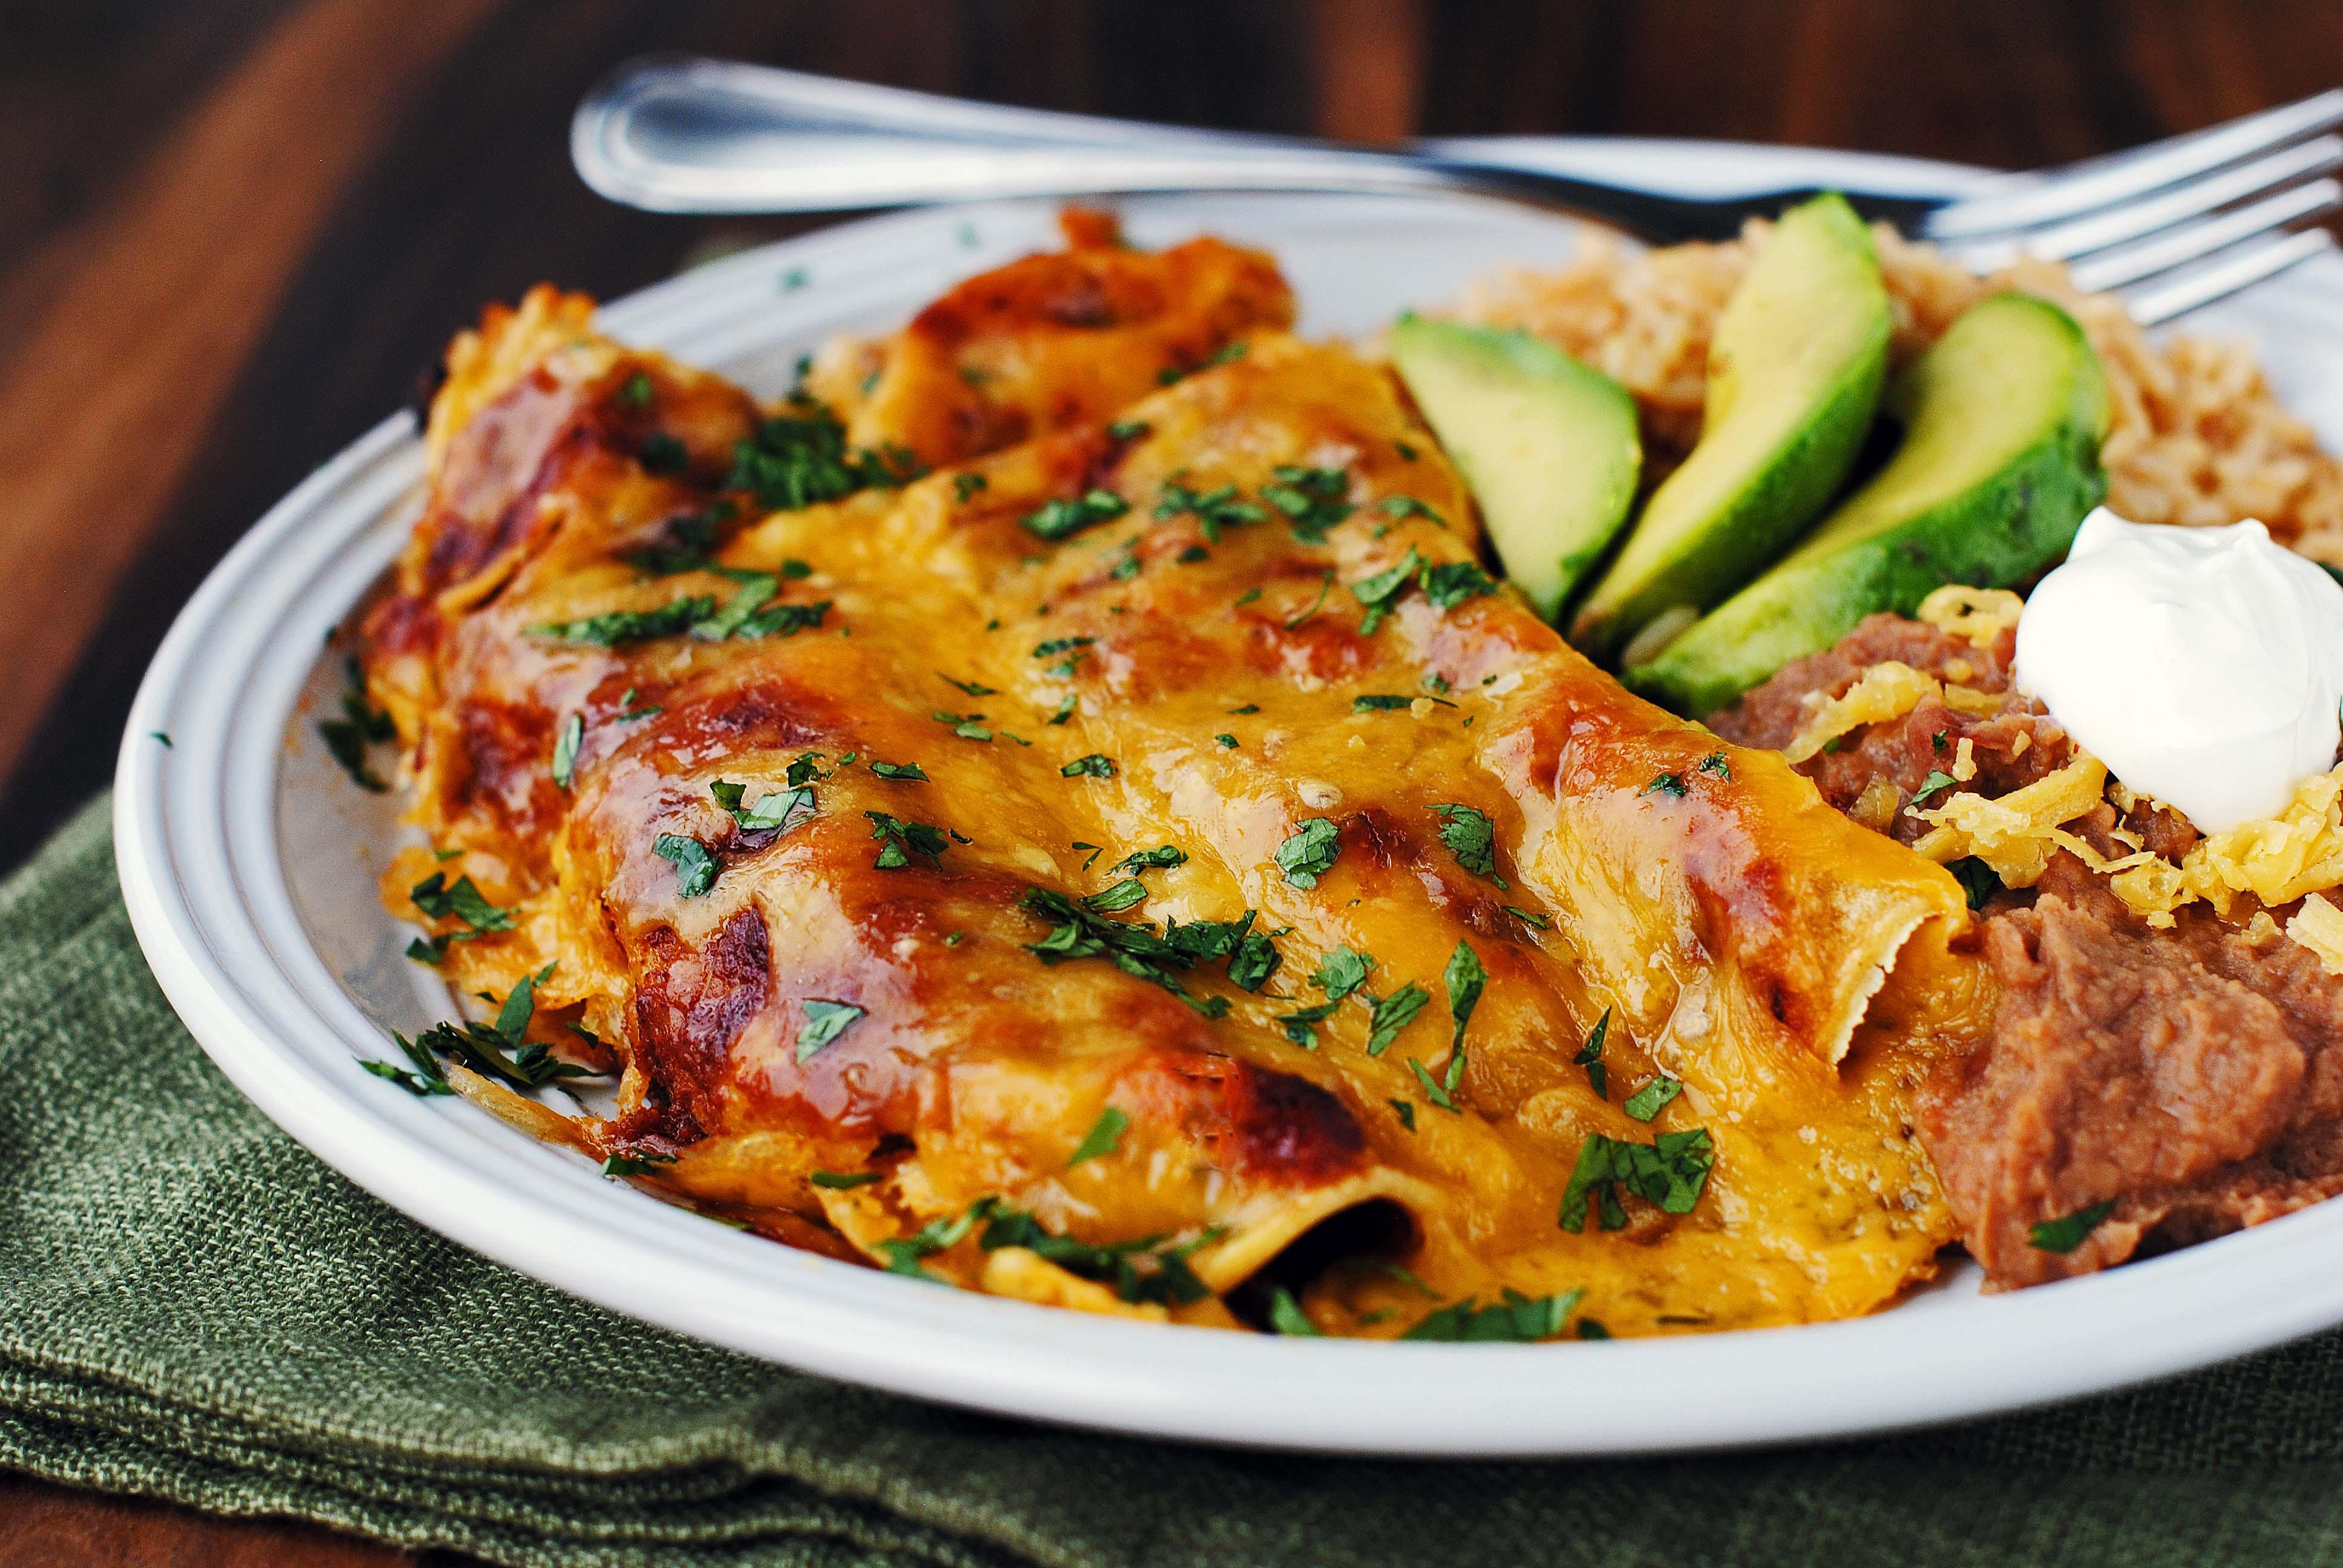 Shredded Beef Enchiladas  Ugly Enchiladas with the BEST Homemade Red Enchilada Sauce